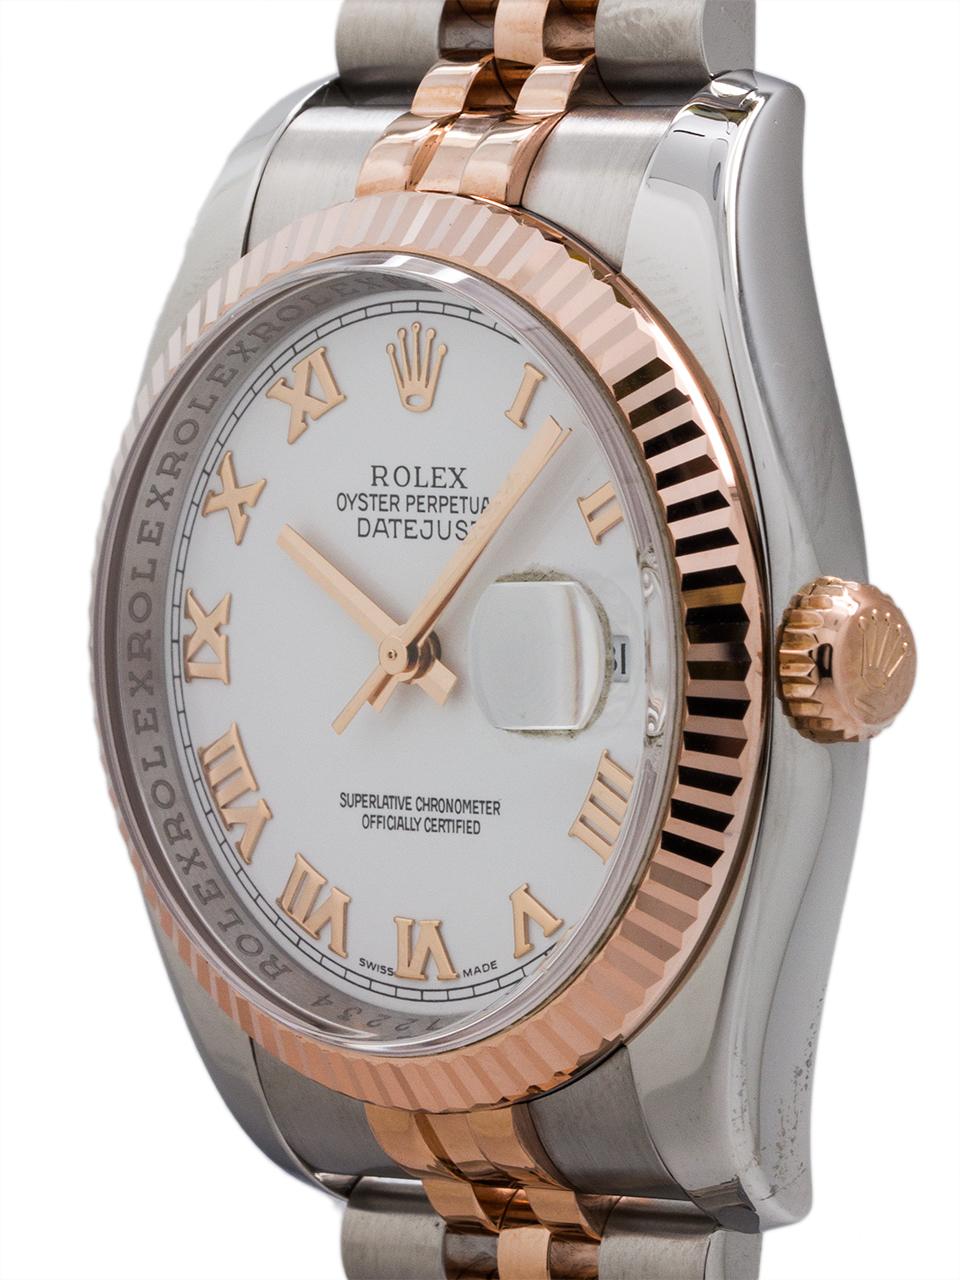 Rolex Man's Datejust ref# 116231 SS/PG circa 2005